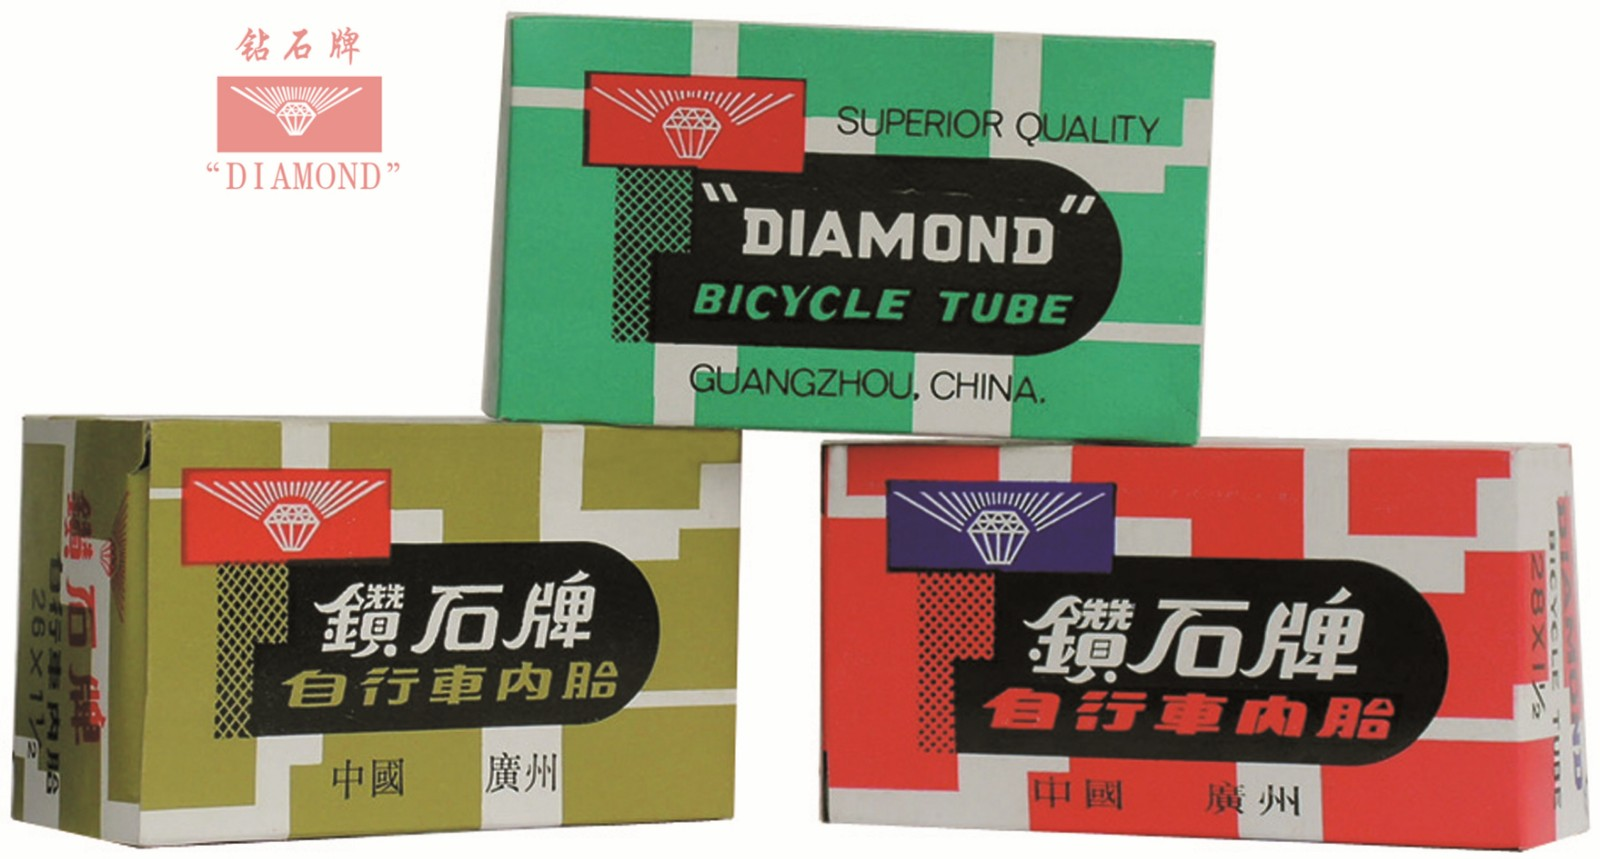 DIAMOND brand Bicycle Tube